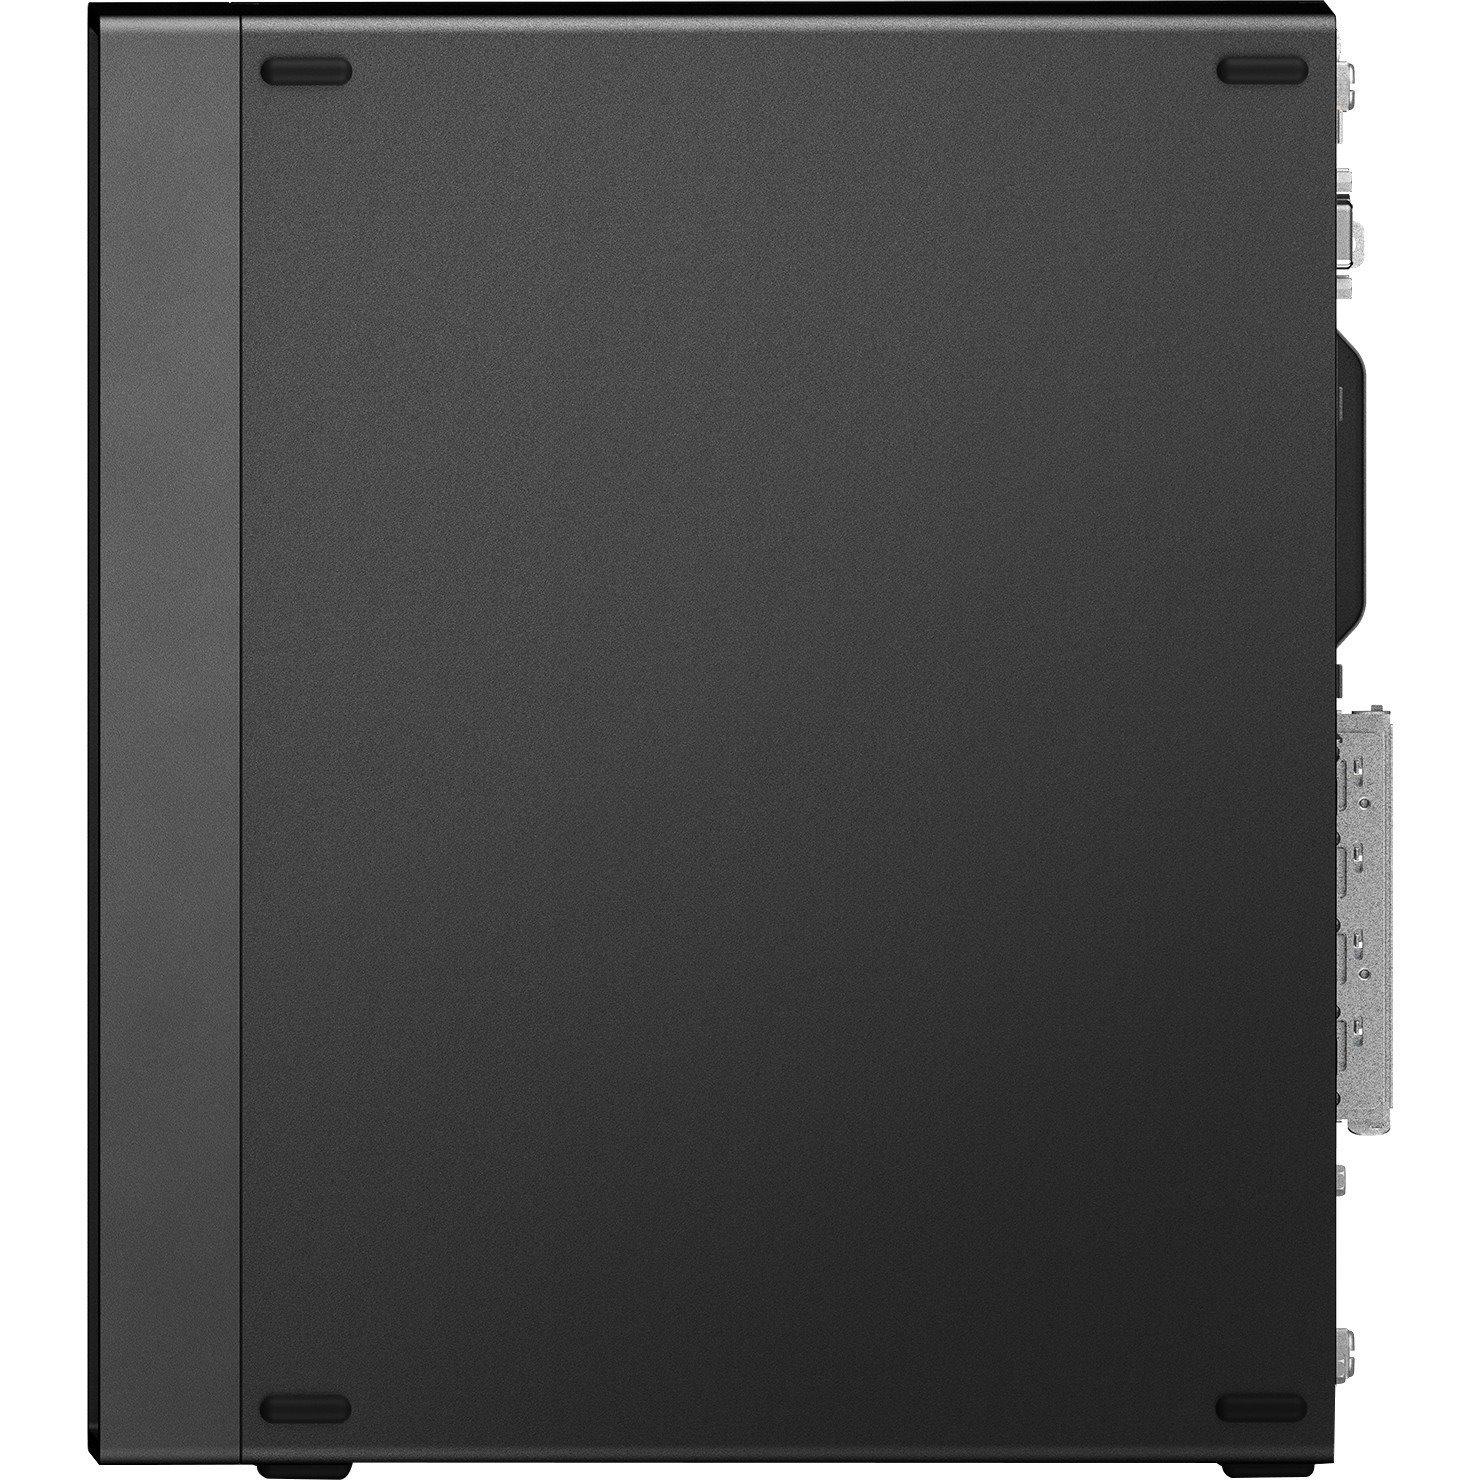 Lenovo ThinkStation P330 30C8S0UU00 Workstation - 1 x Intel Xeon E-2124G 3.40 GHz - 16 GB DDR4 SDRAM - 256 GB SSDNVIDIA Quadro P400 2 GB Graphics - Windows 10 Pro for Workstations 64-bit - Small Form Factor